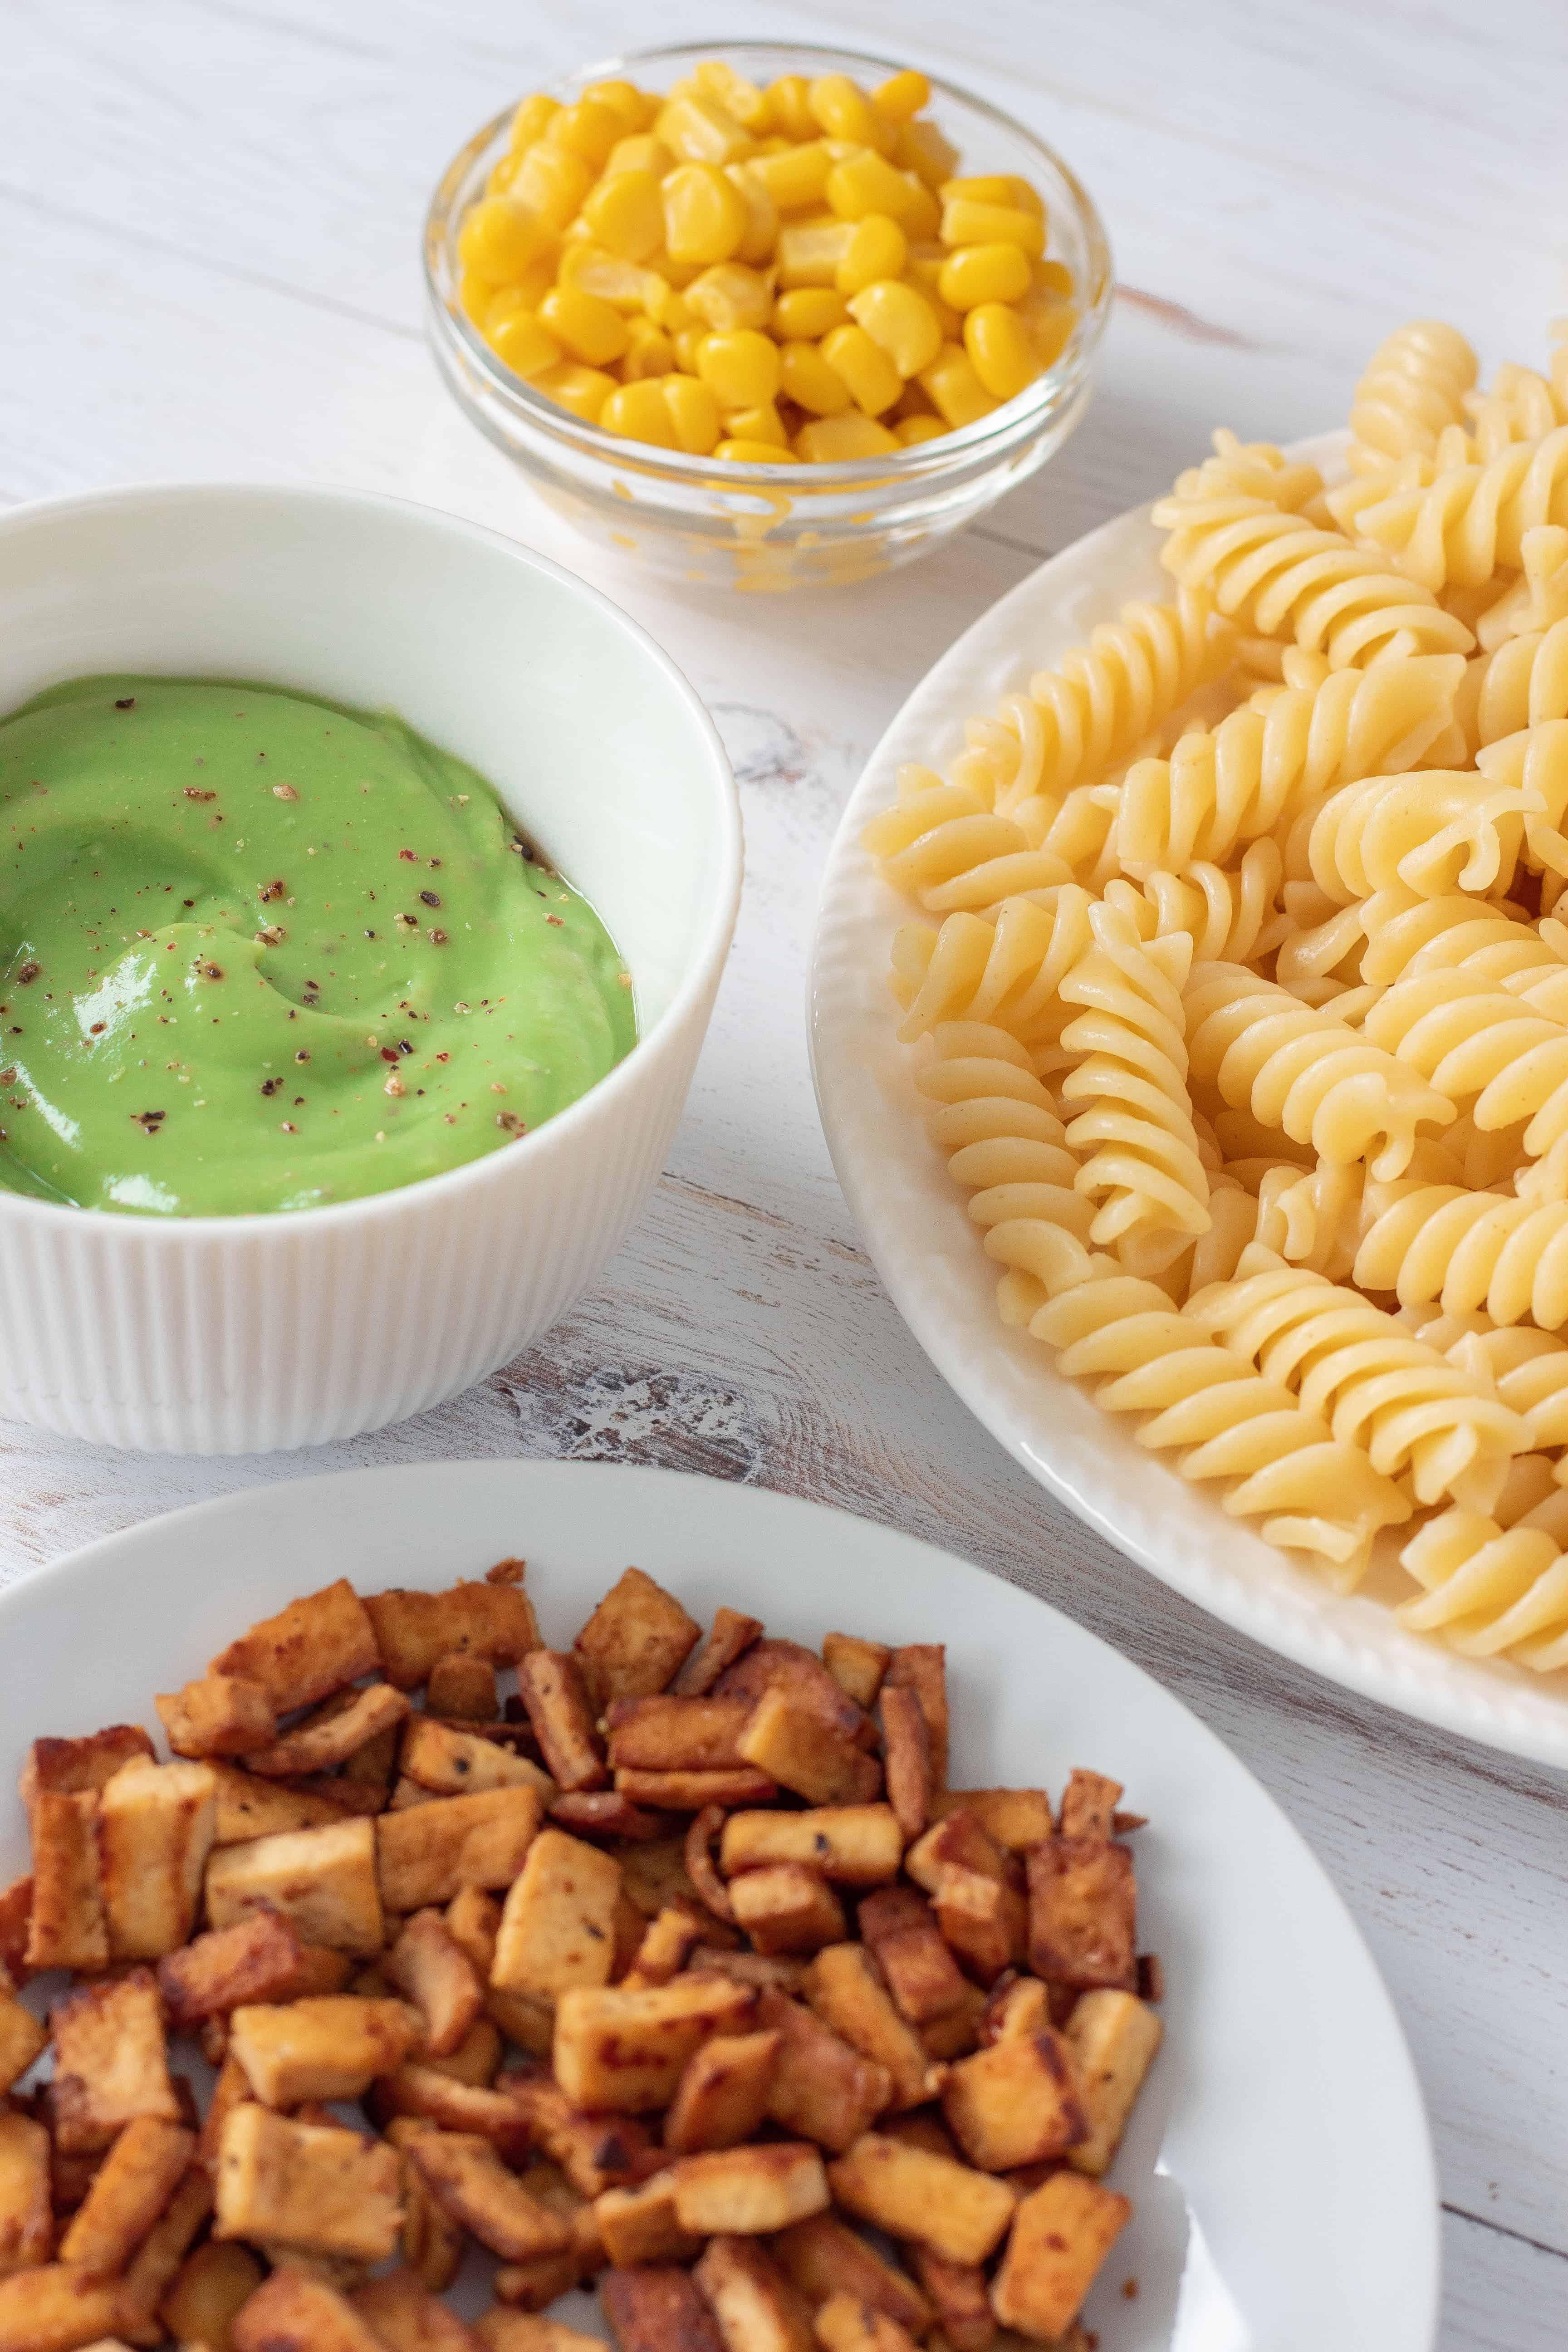 Vegan Avocado Pasta with Tofu Bacon Ingredients